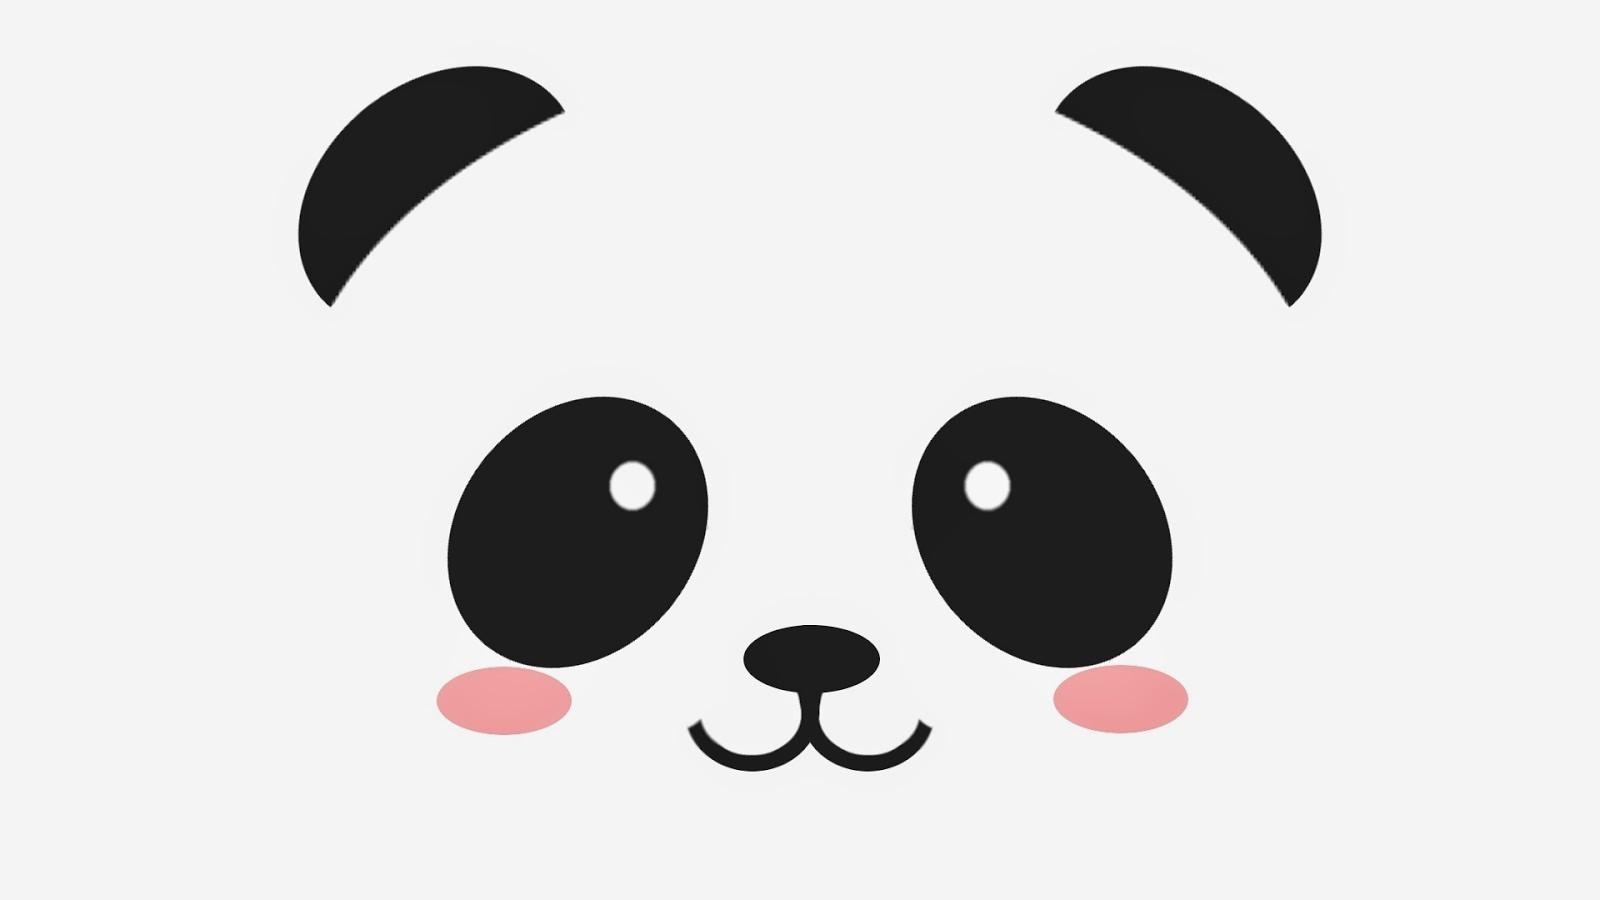 Cute panda tumblr themes - photo#45